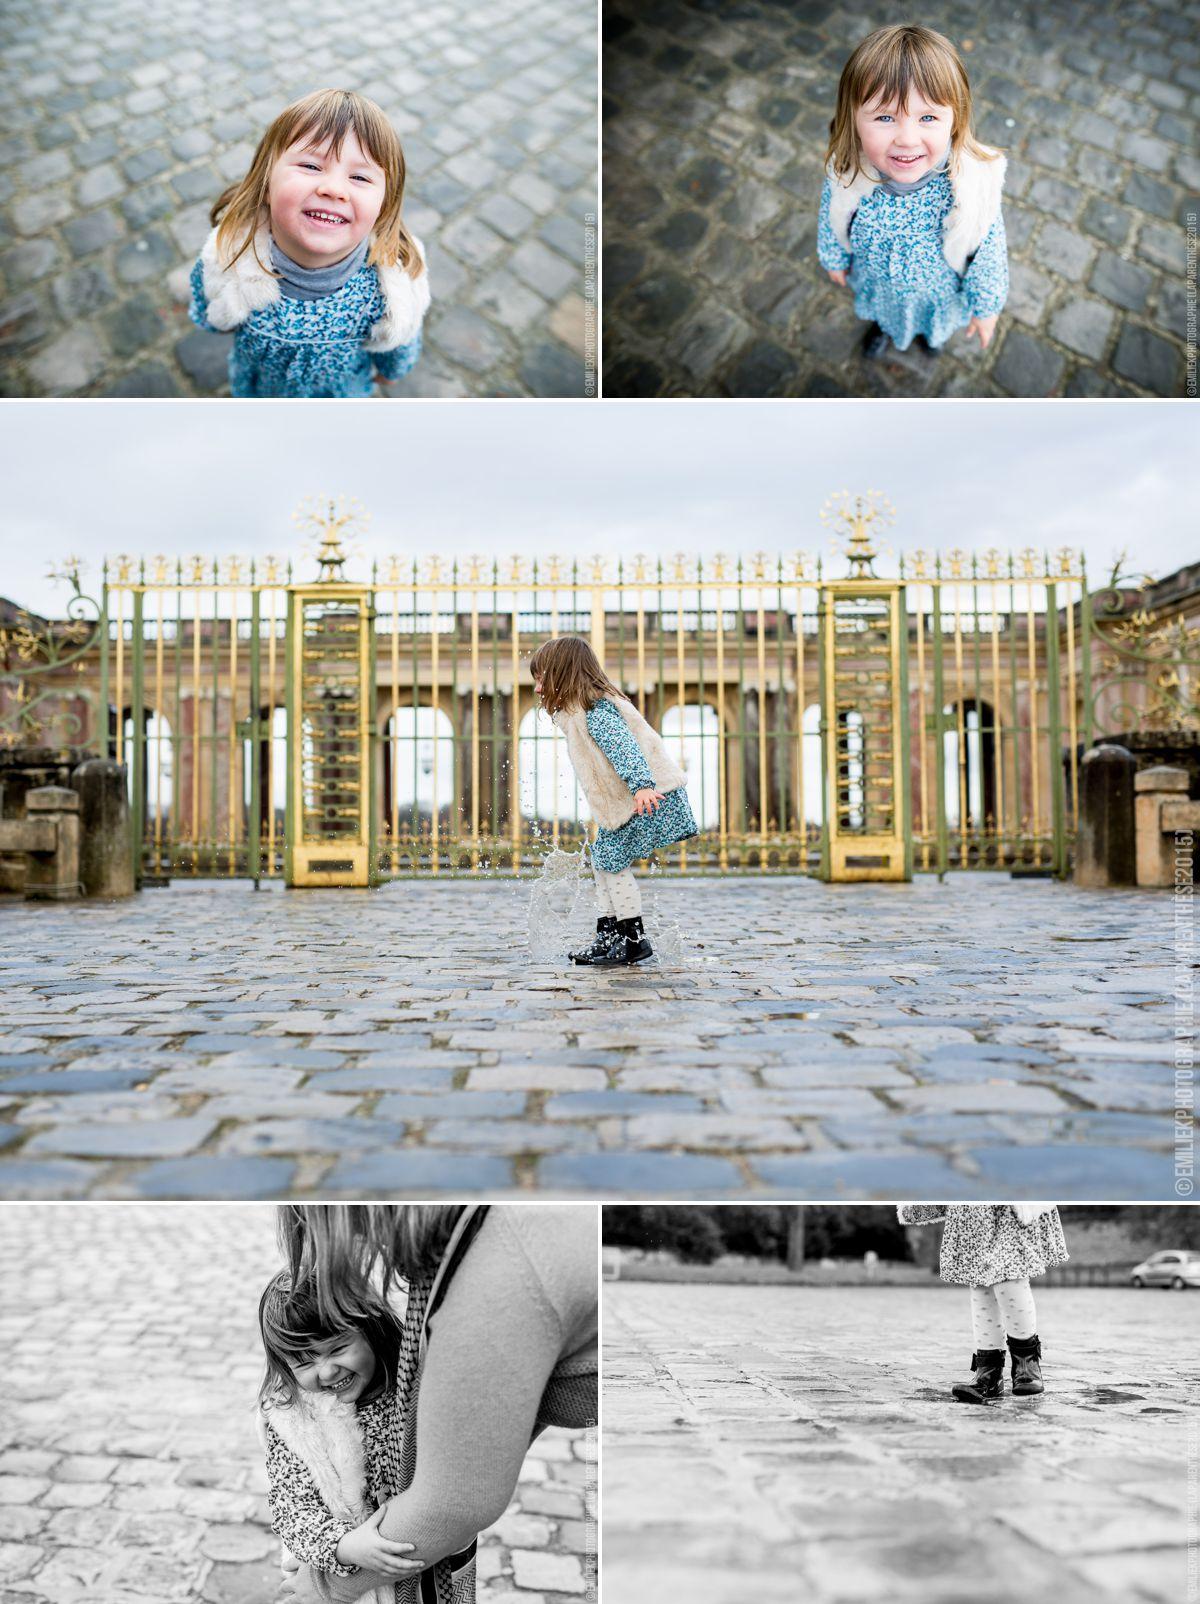 seancefamille-photographeemiliekphotographe-versailles 1